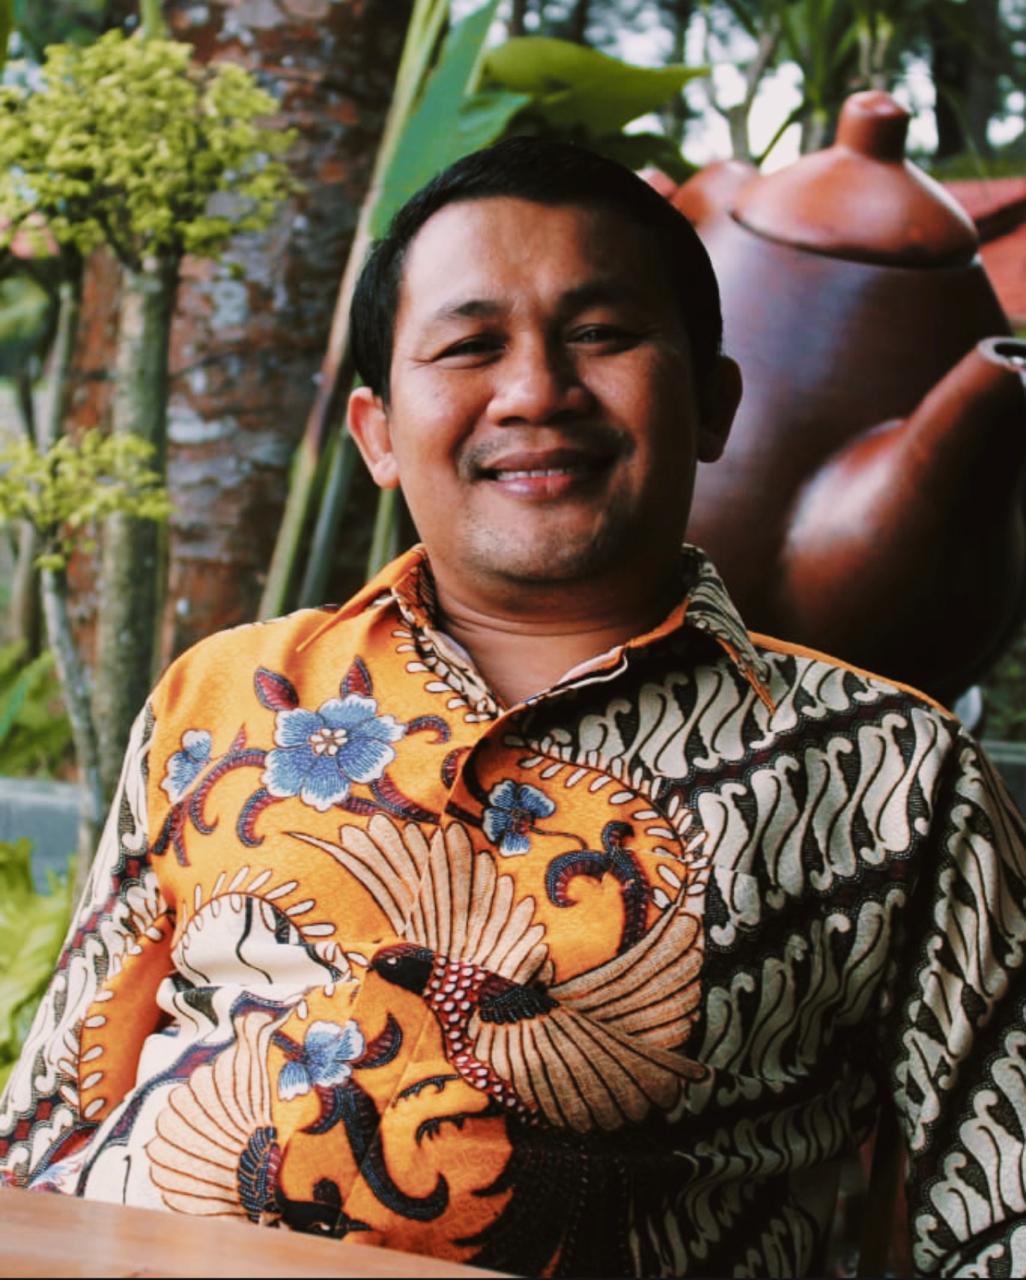 DPRD Sebut Keputusan Wahidin Halim Ngutang Rp 4 Triliun ke PT SMI Hanya Akan Membebani APBD